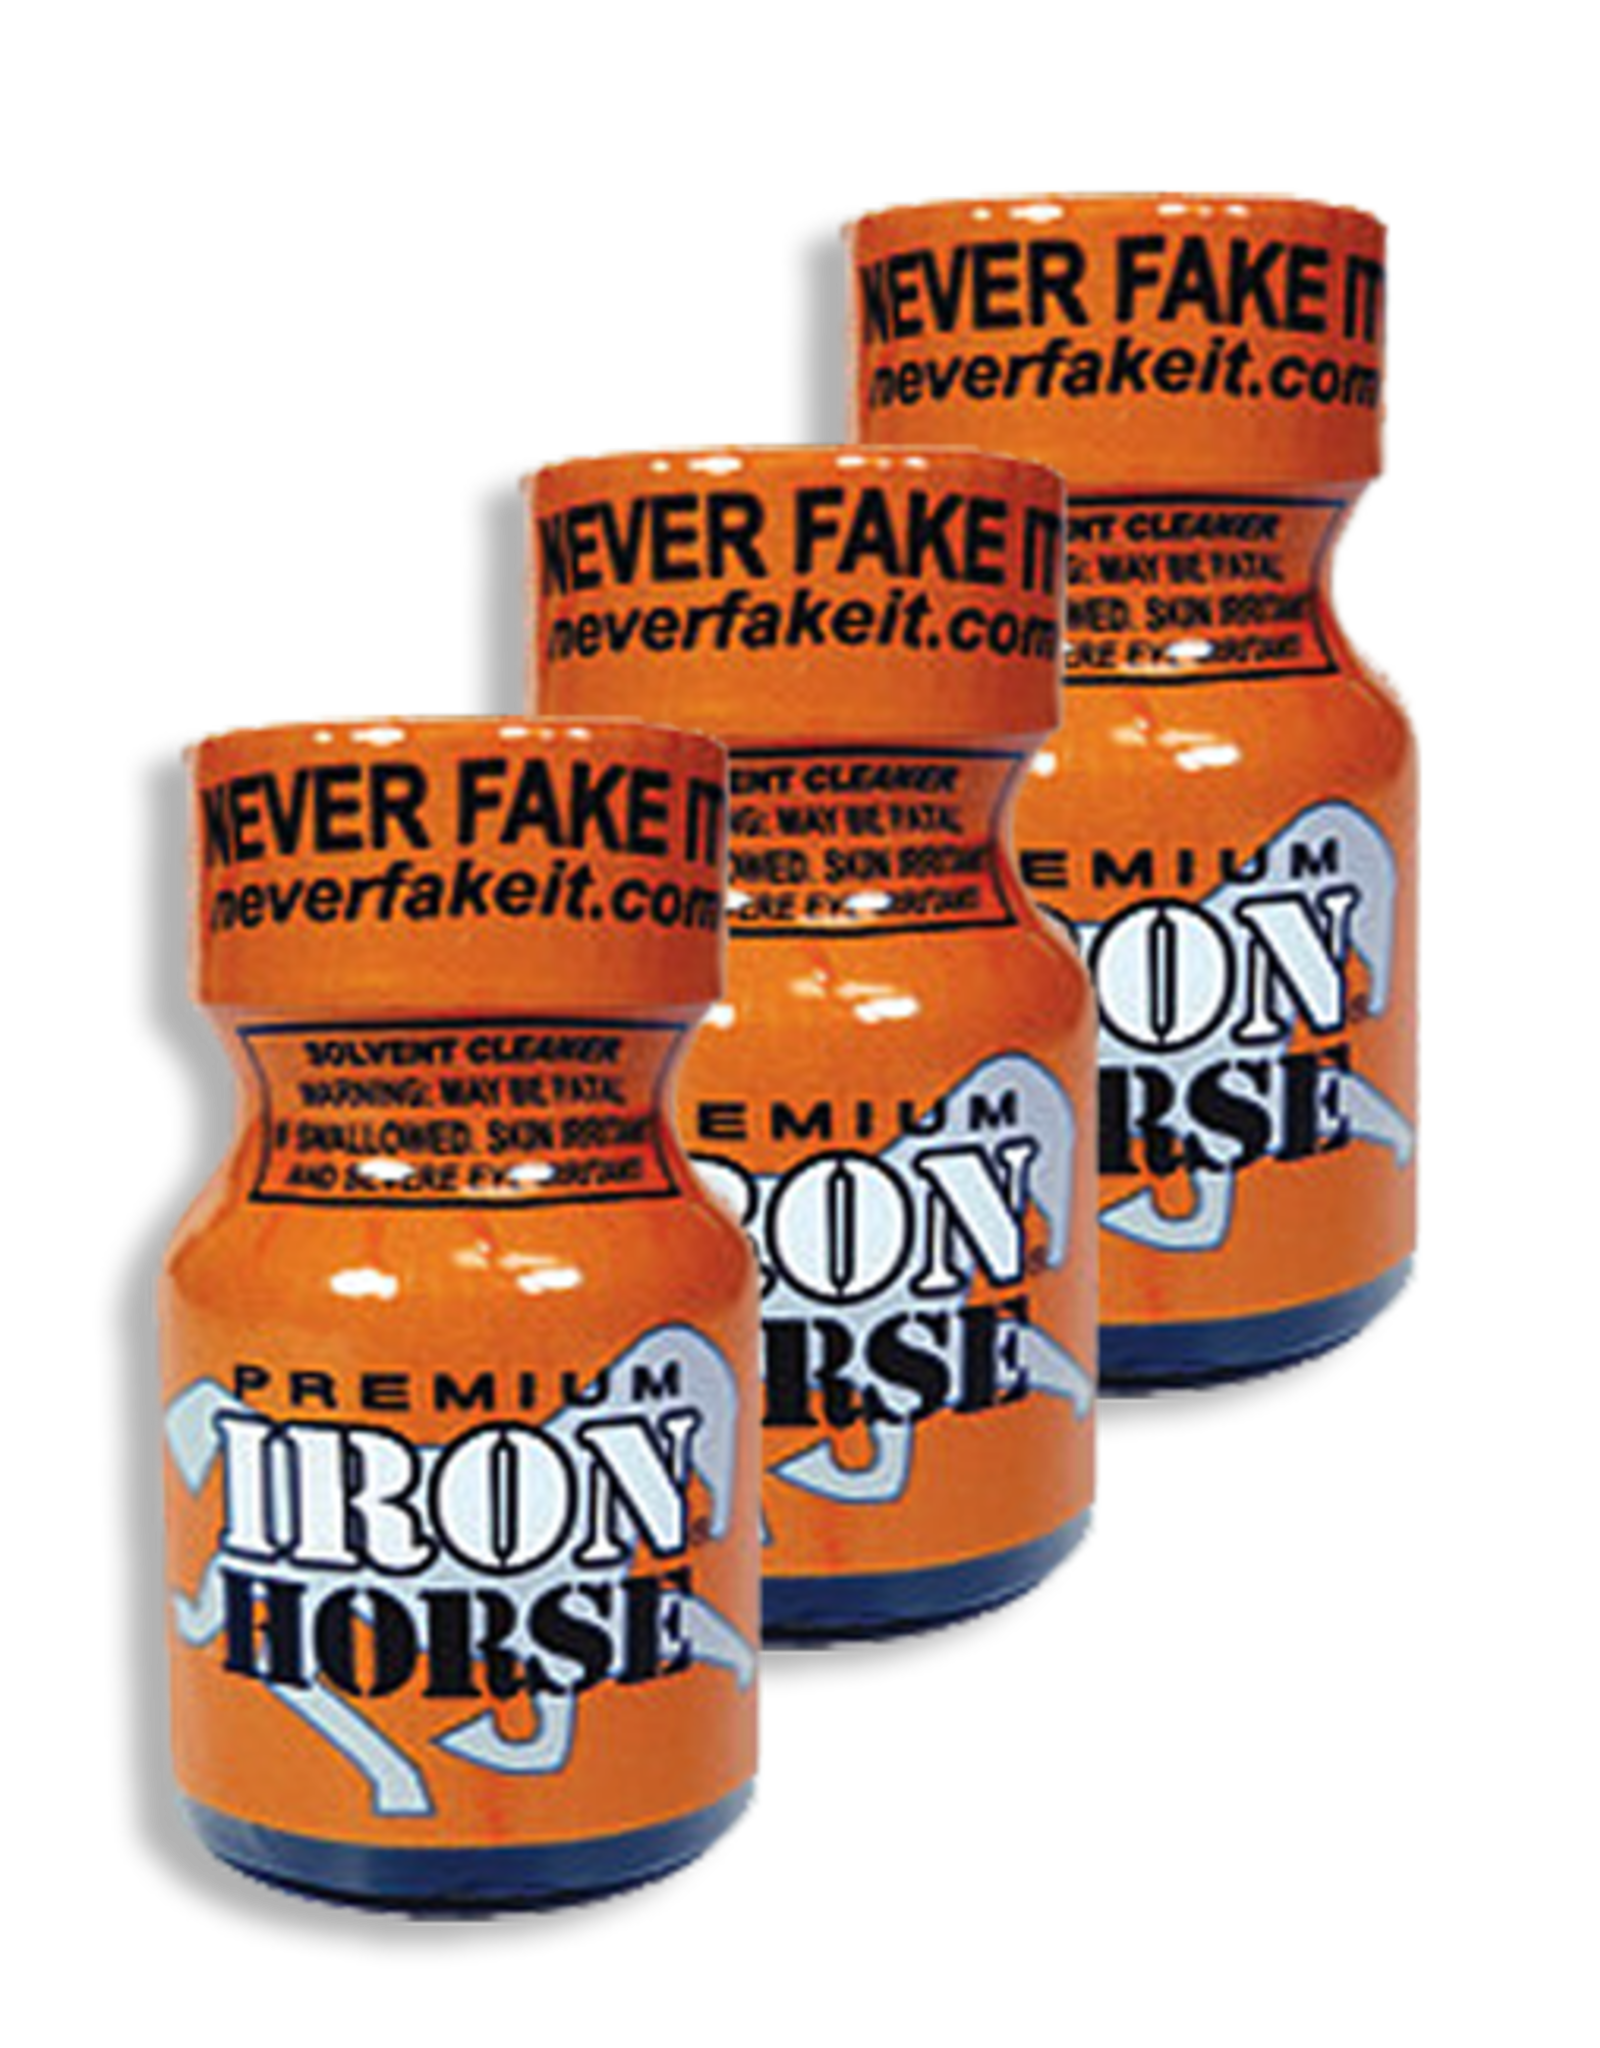 PWD Iron Horse 10 ml